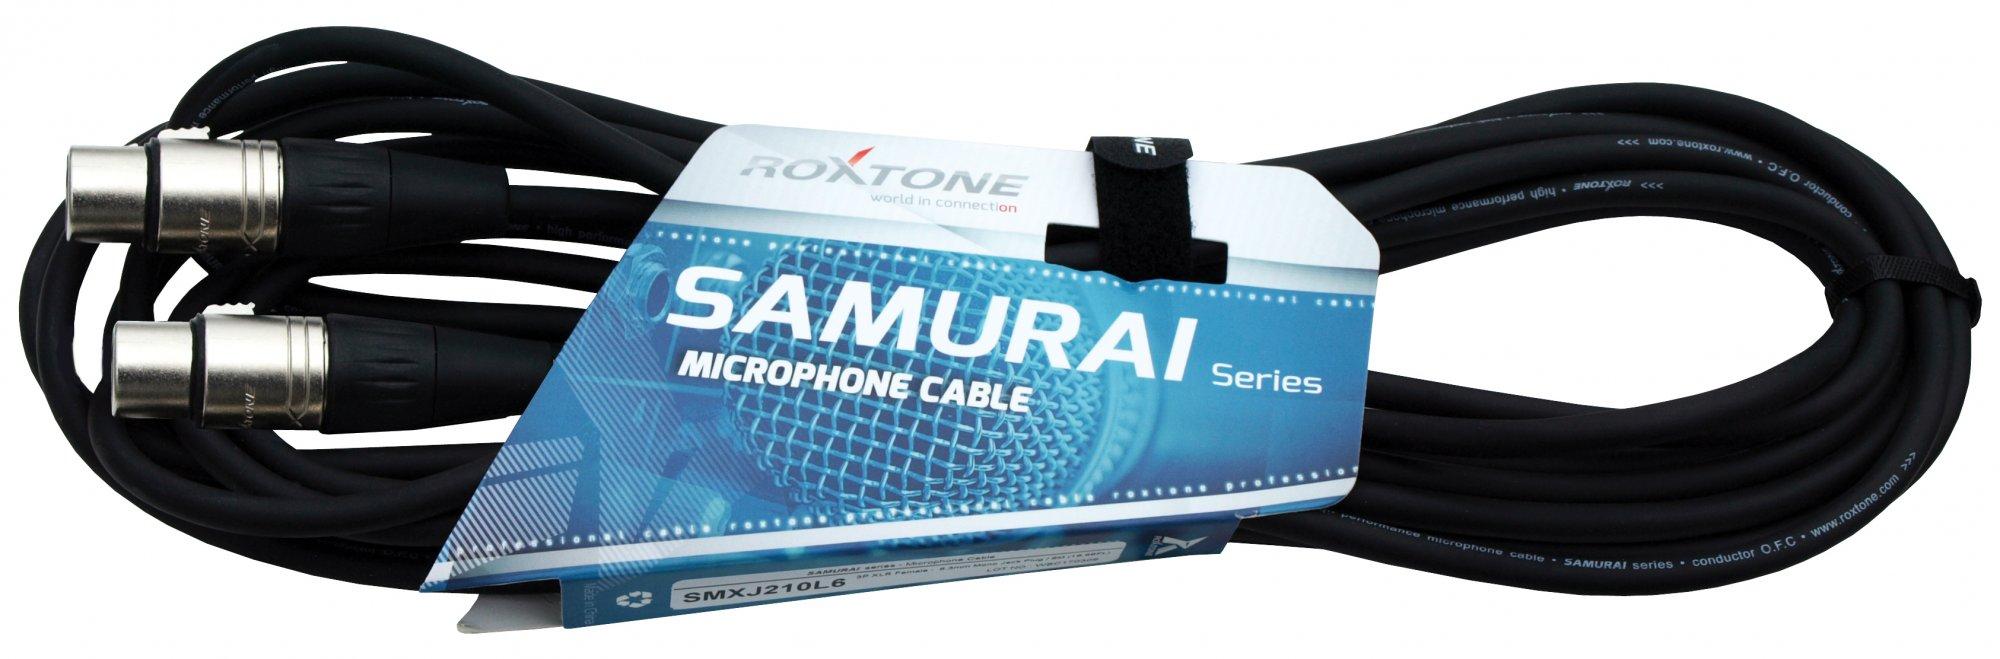 Roxtone Samurai SMXX200L15